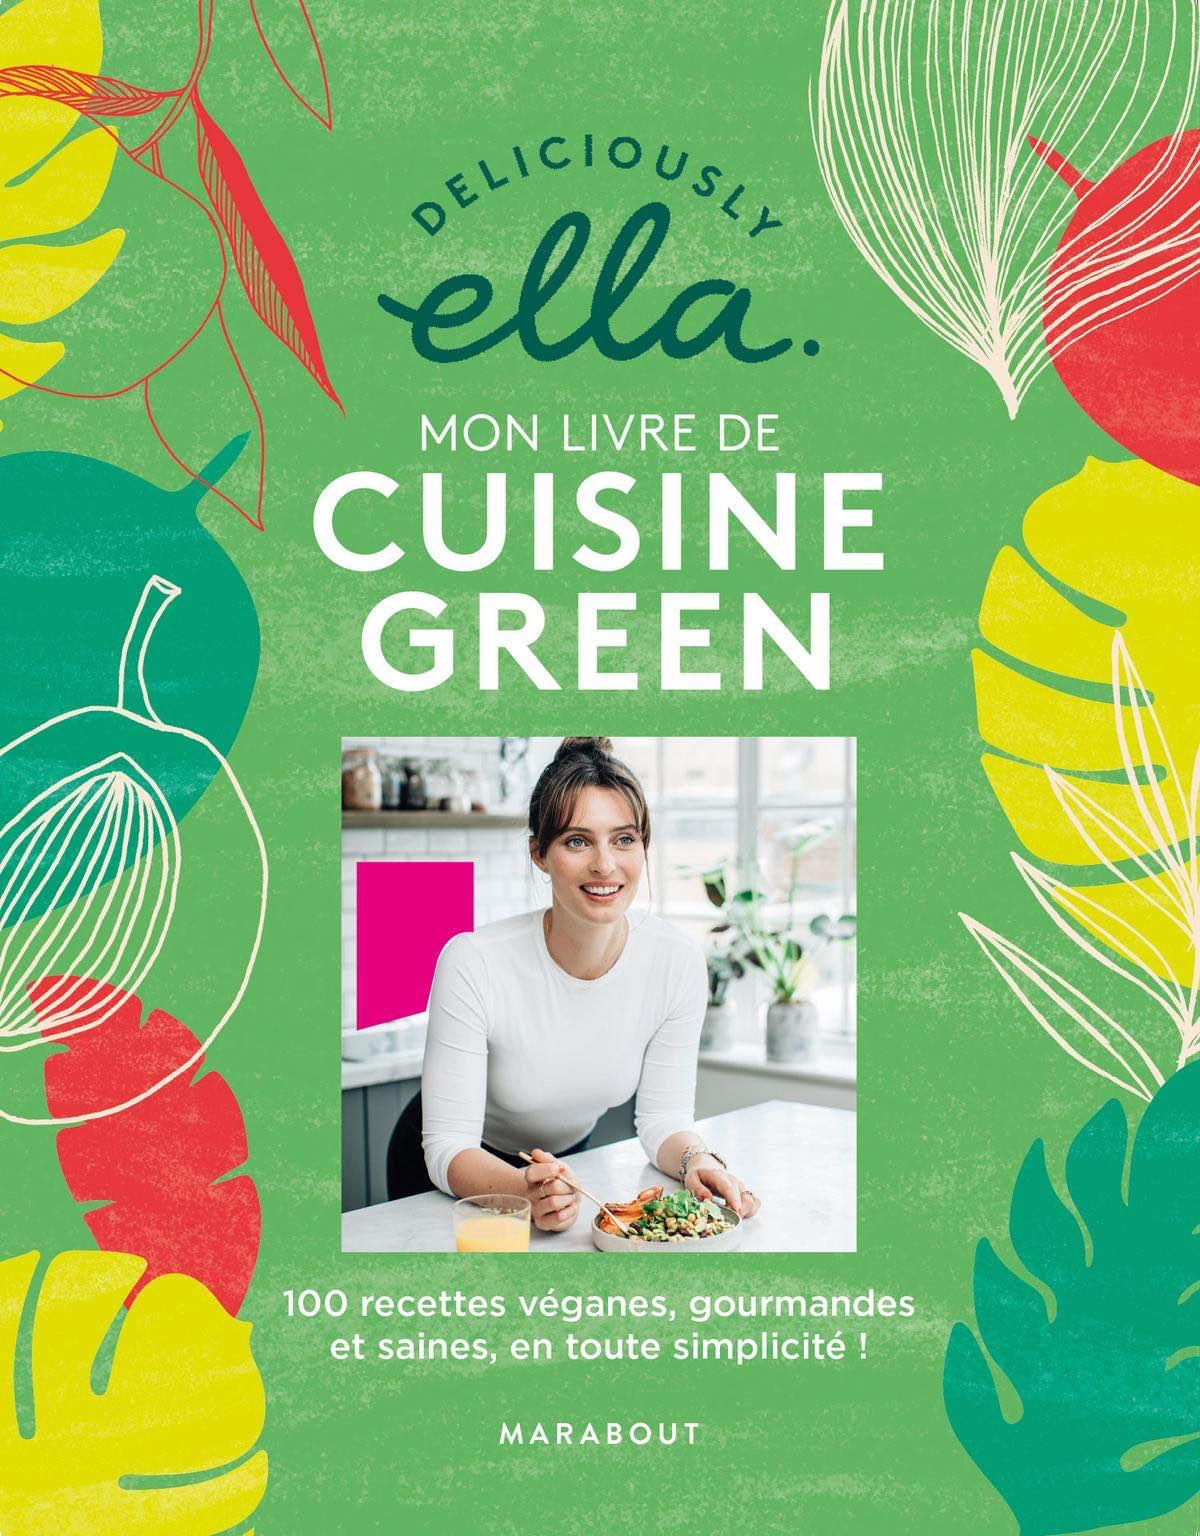 Deliciously Ella, Mon livre de cuisine green